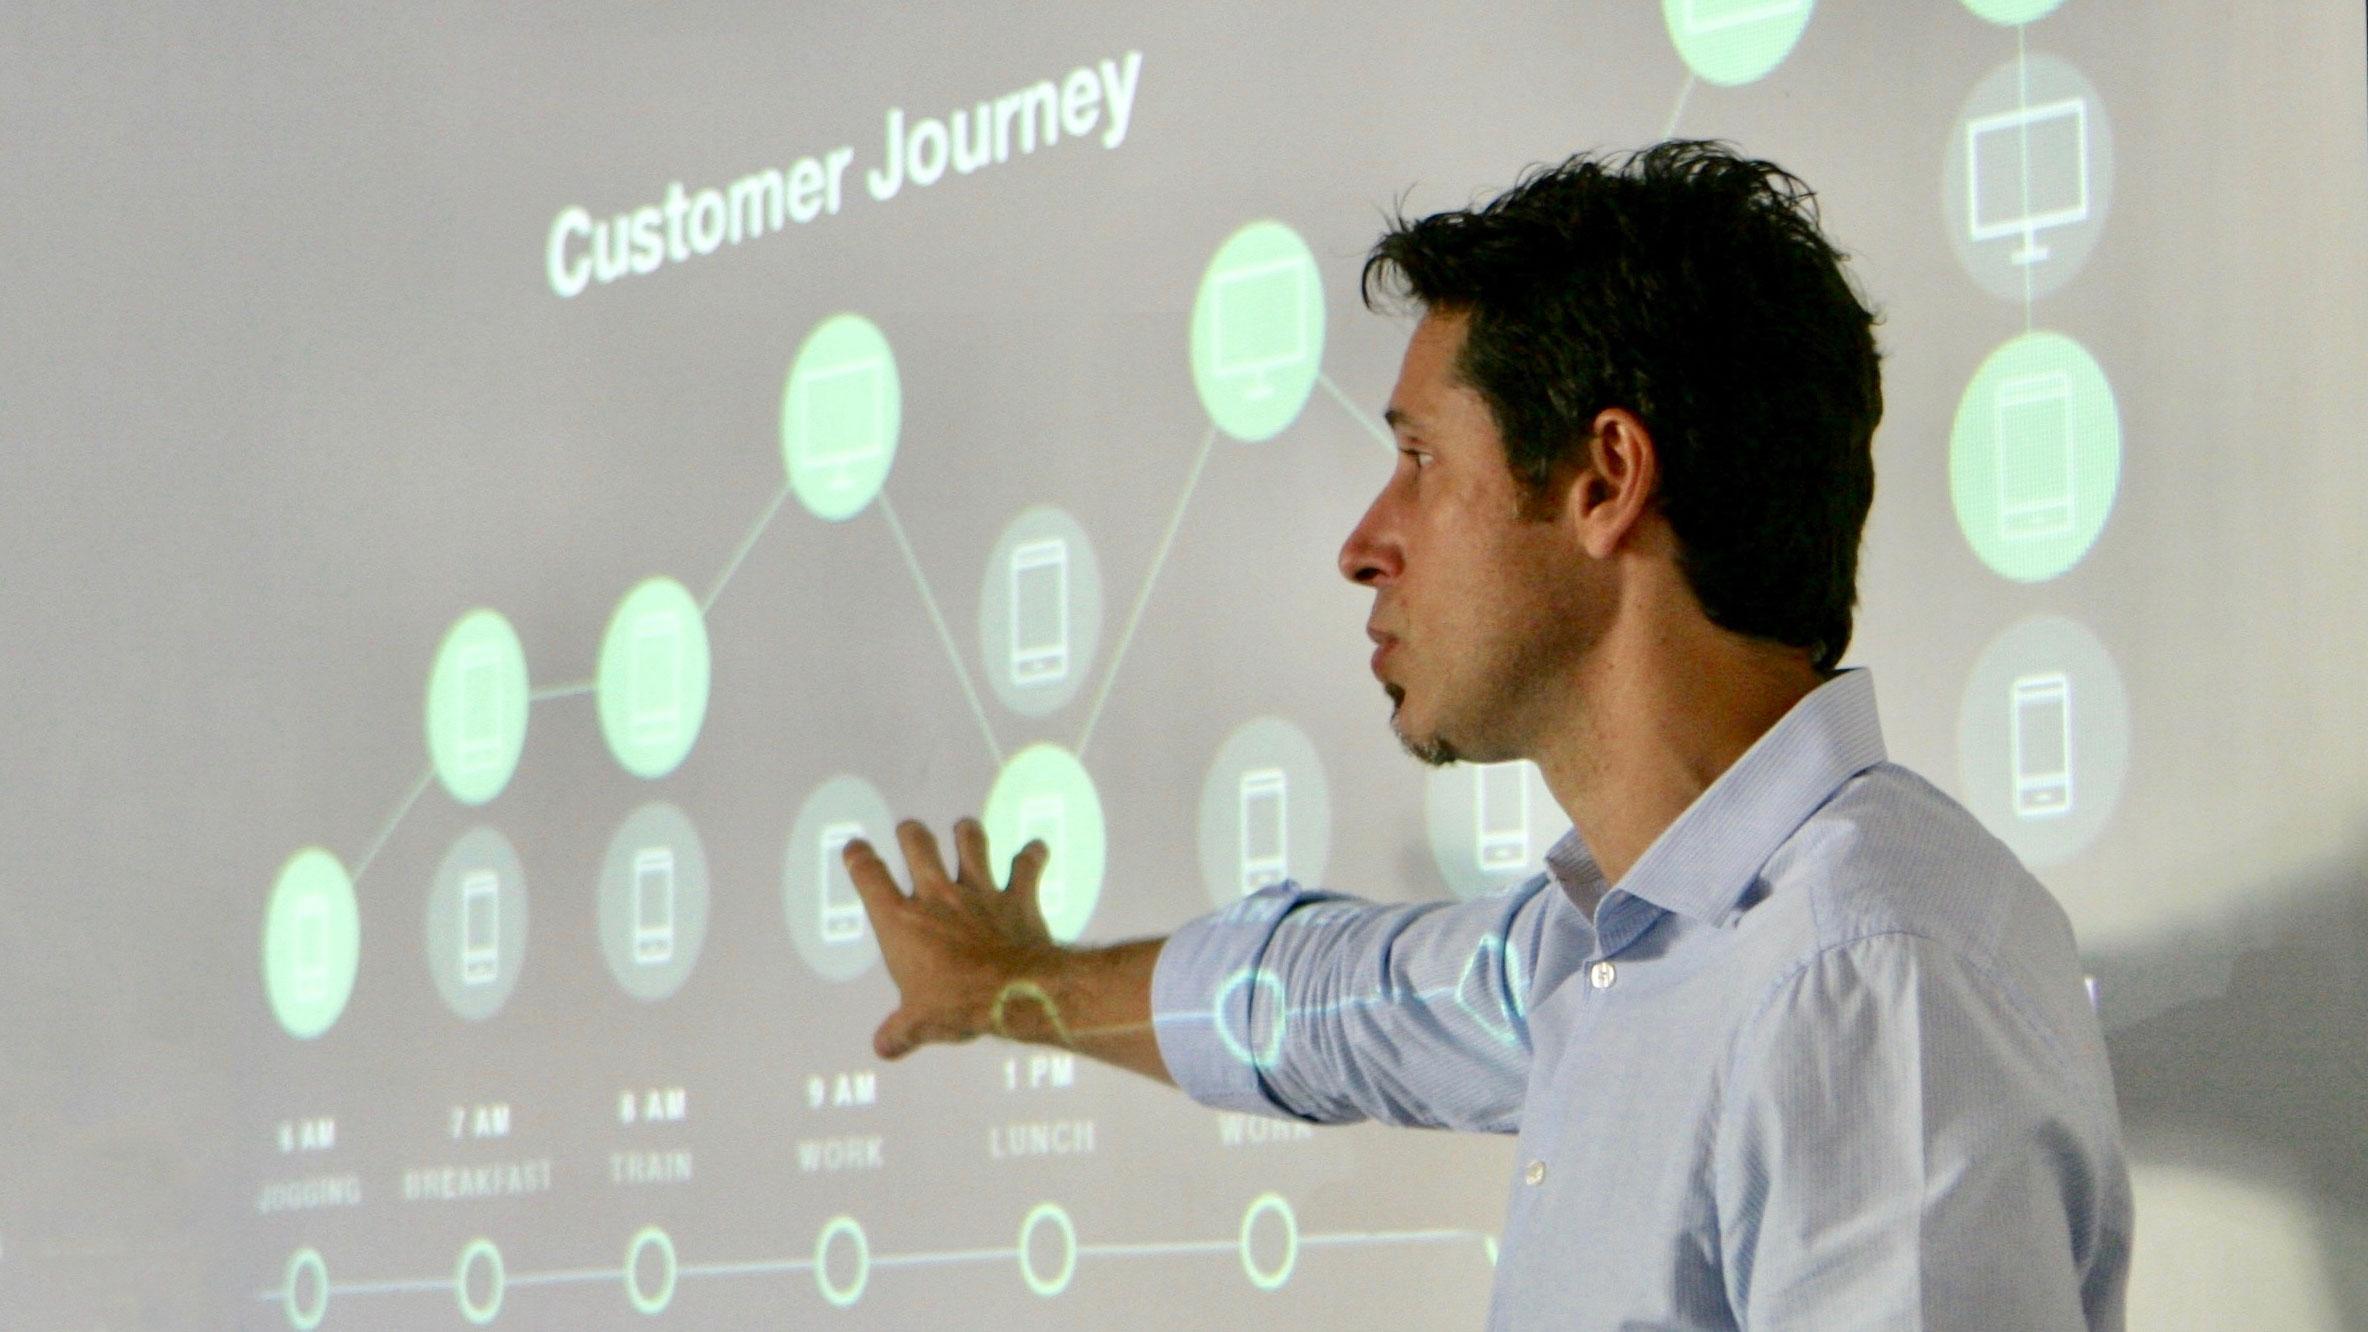 Gabriel Celemin Customer Journey